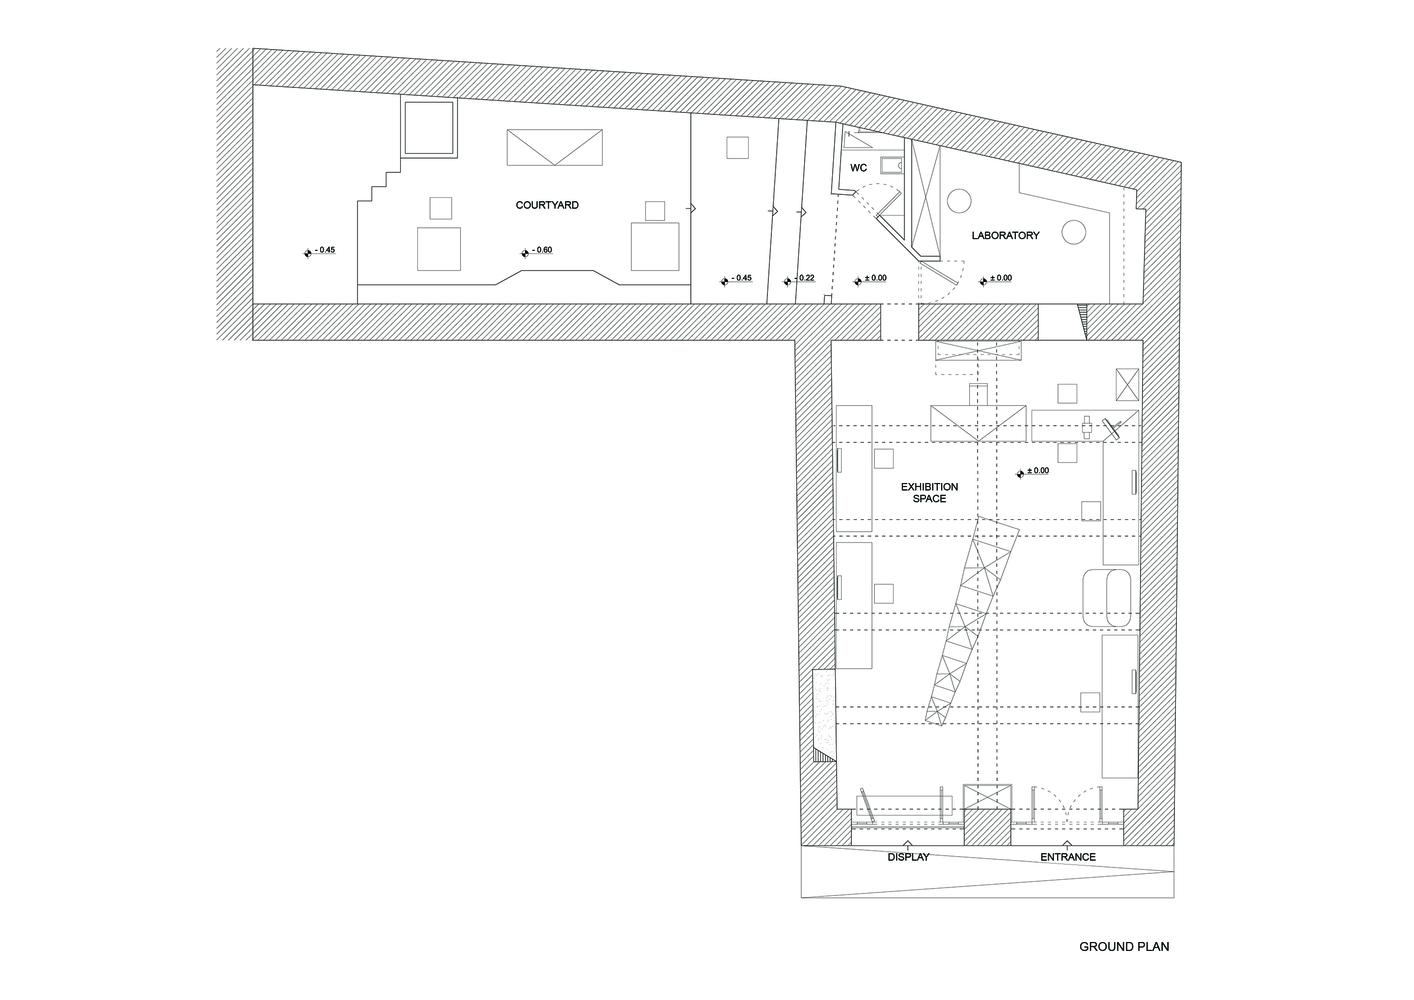 314_Architecture_Studio-glasses_store_ground_plan-hisheji